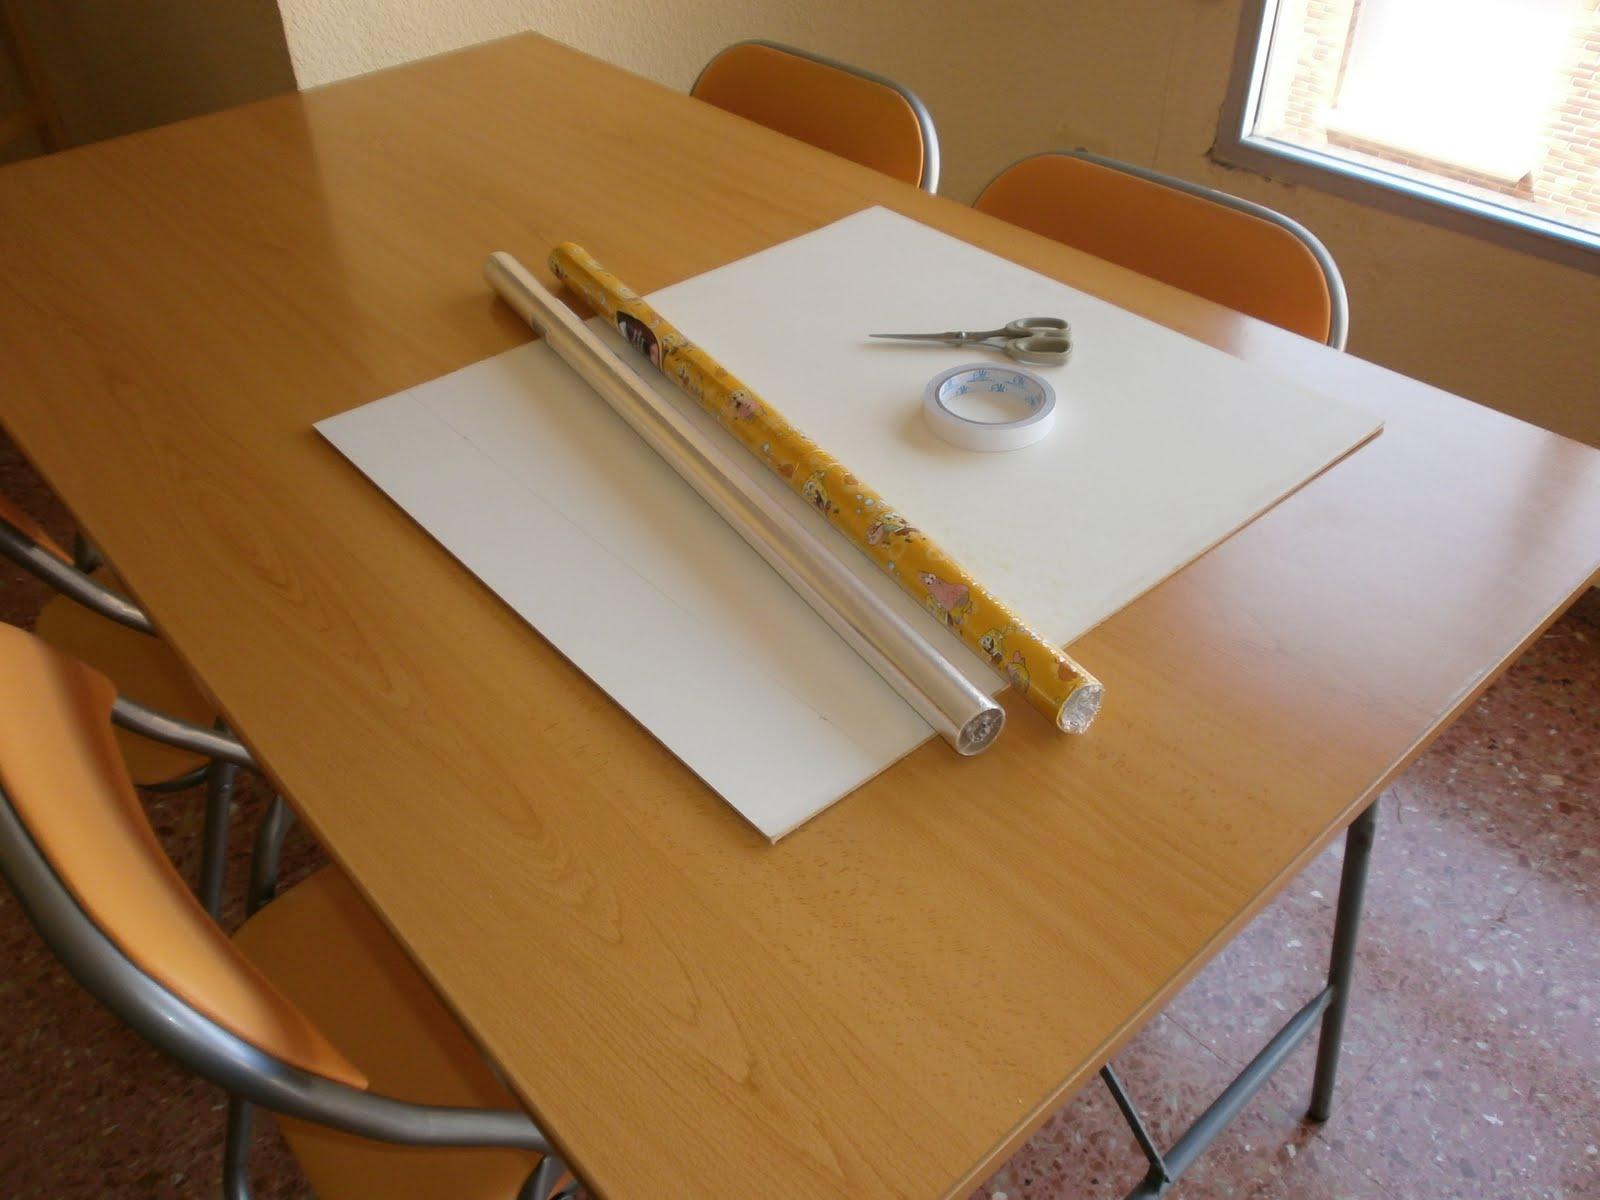 Manualidades decoraci n pintura pizarra bob esponja - Como quitar cinta adhesiva doble cara de la pared ...